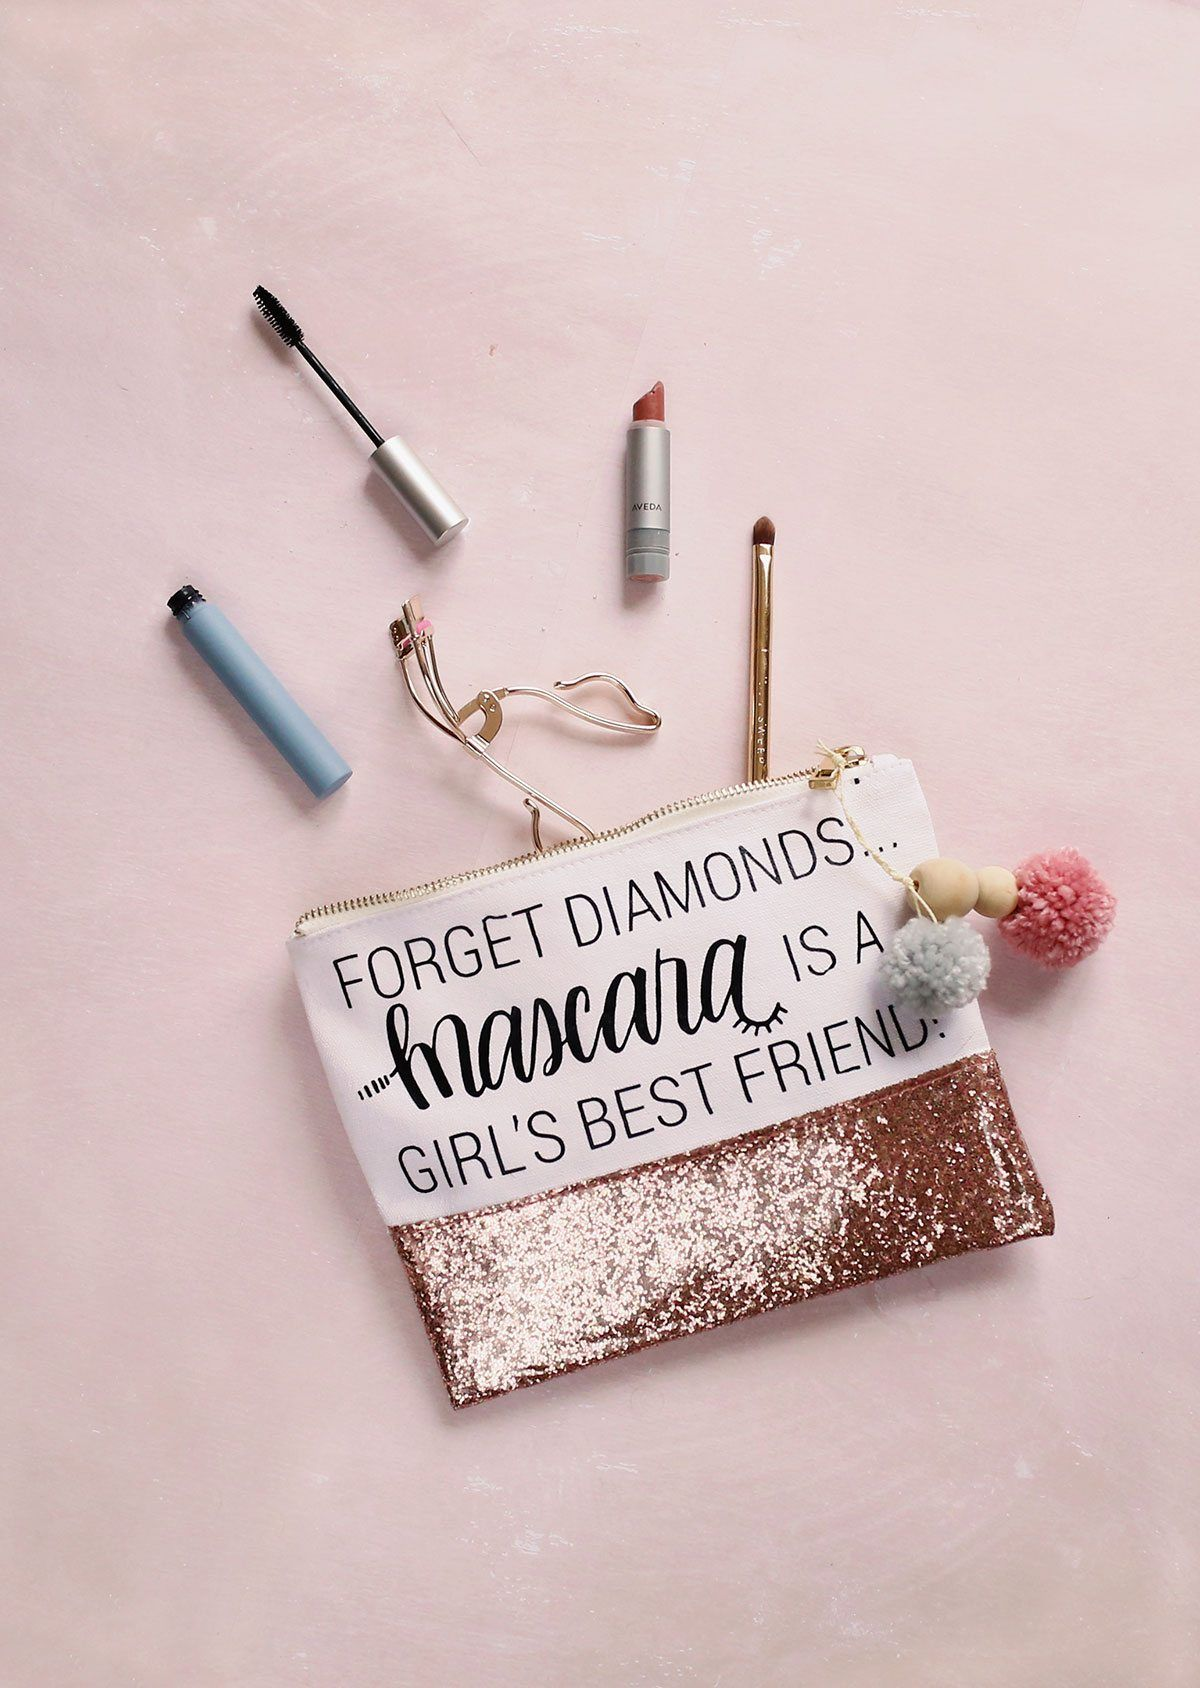 How to Make a Cute DIY Makeup Bag + Free Printable